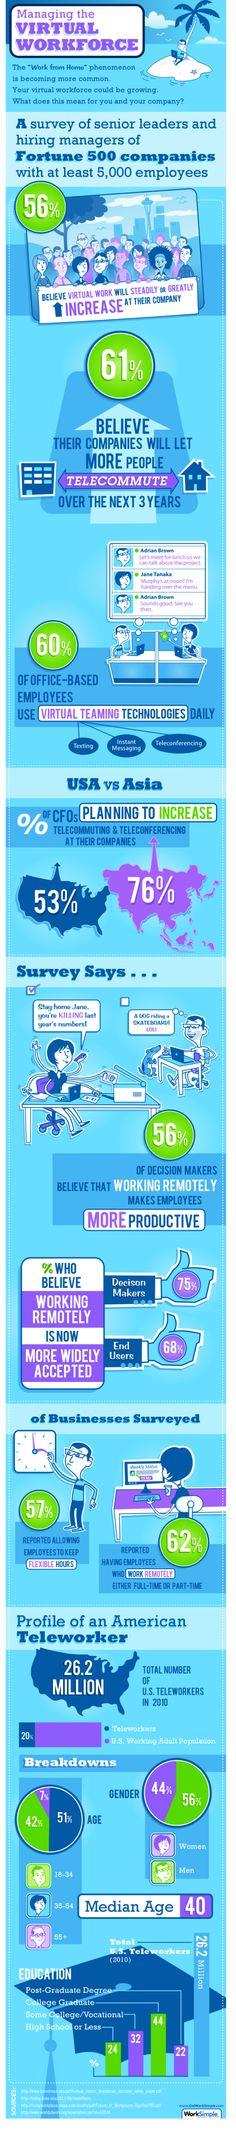 virtual workforce infographic